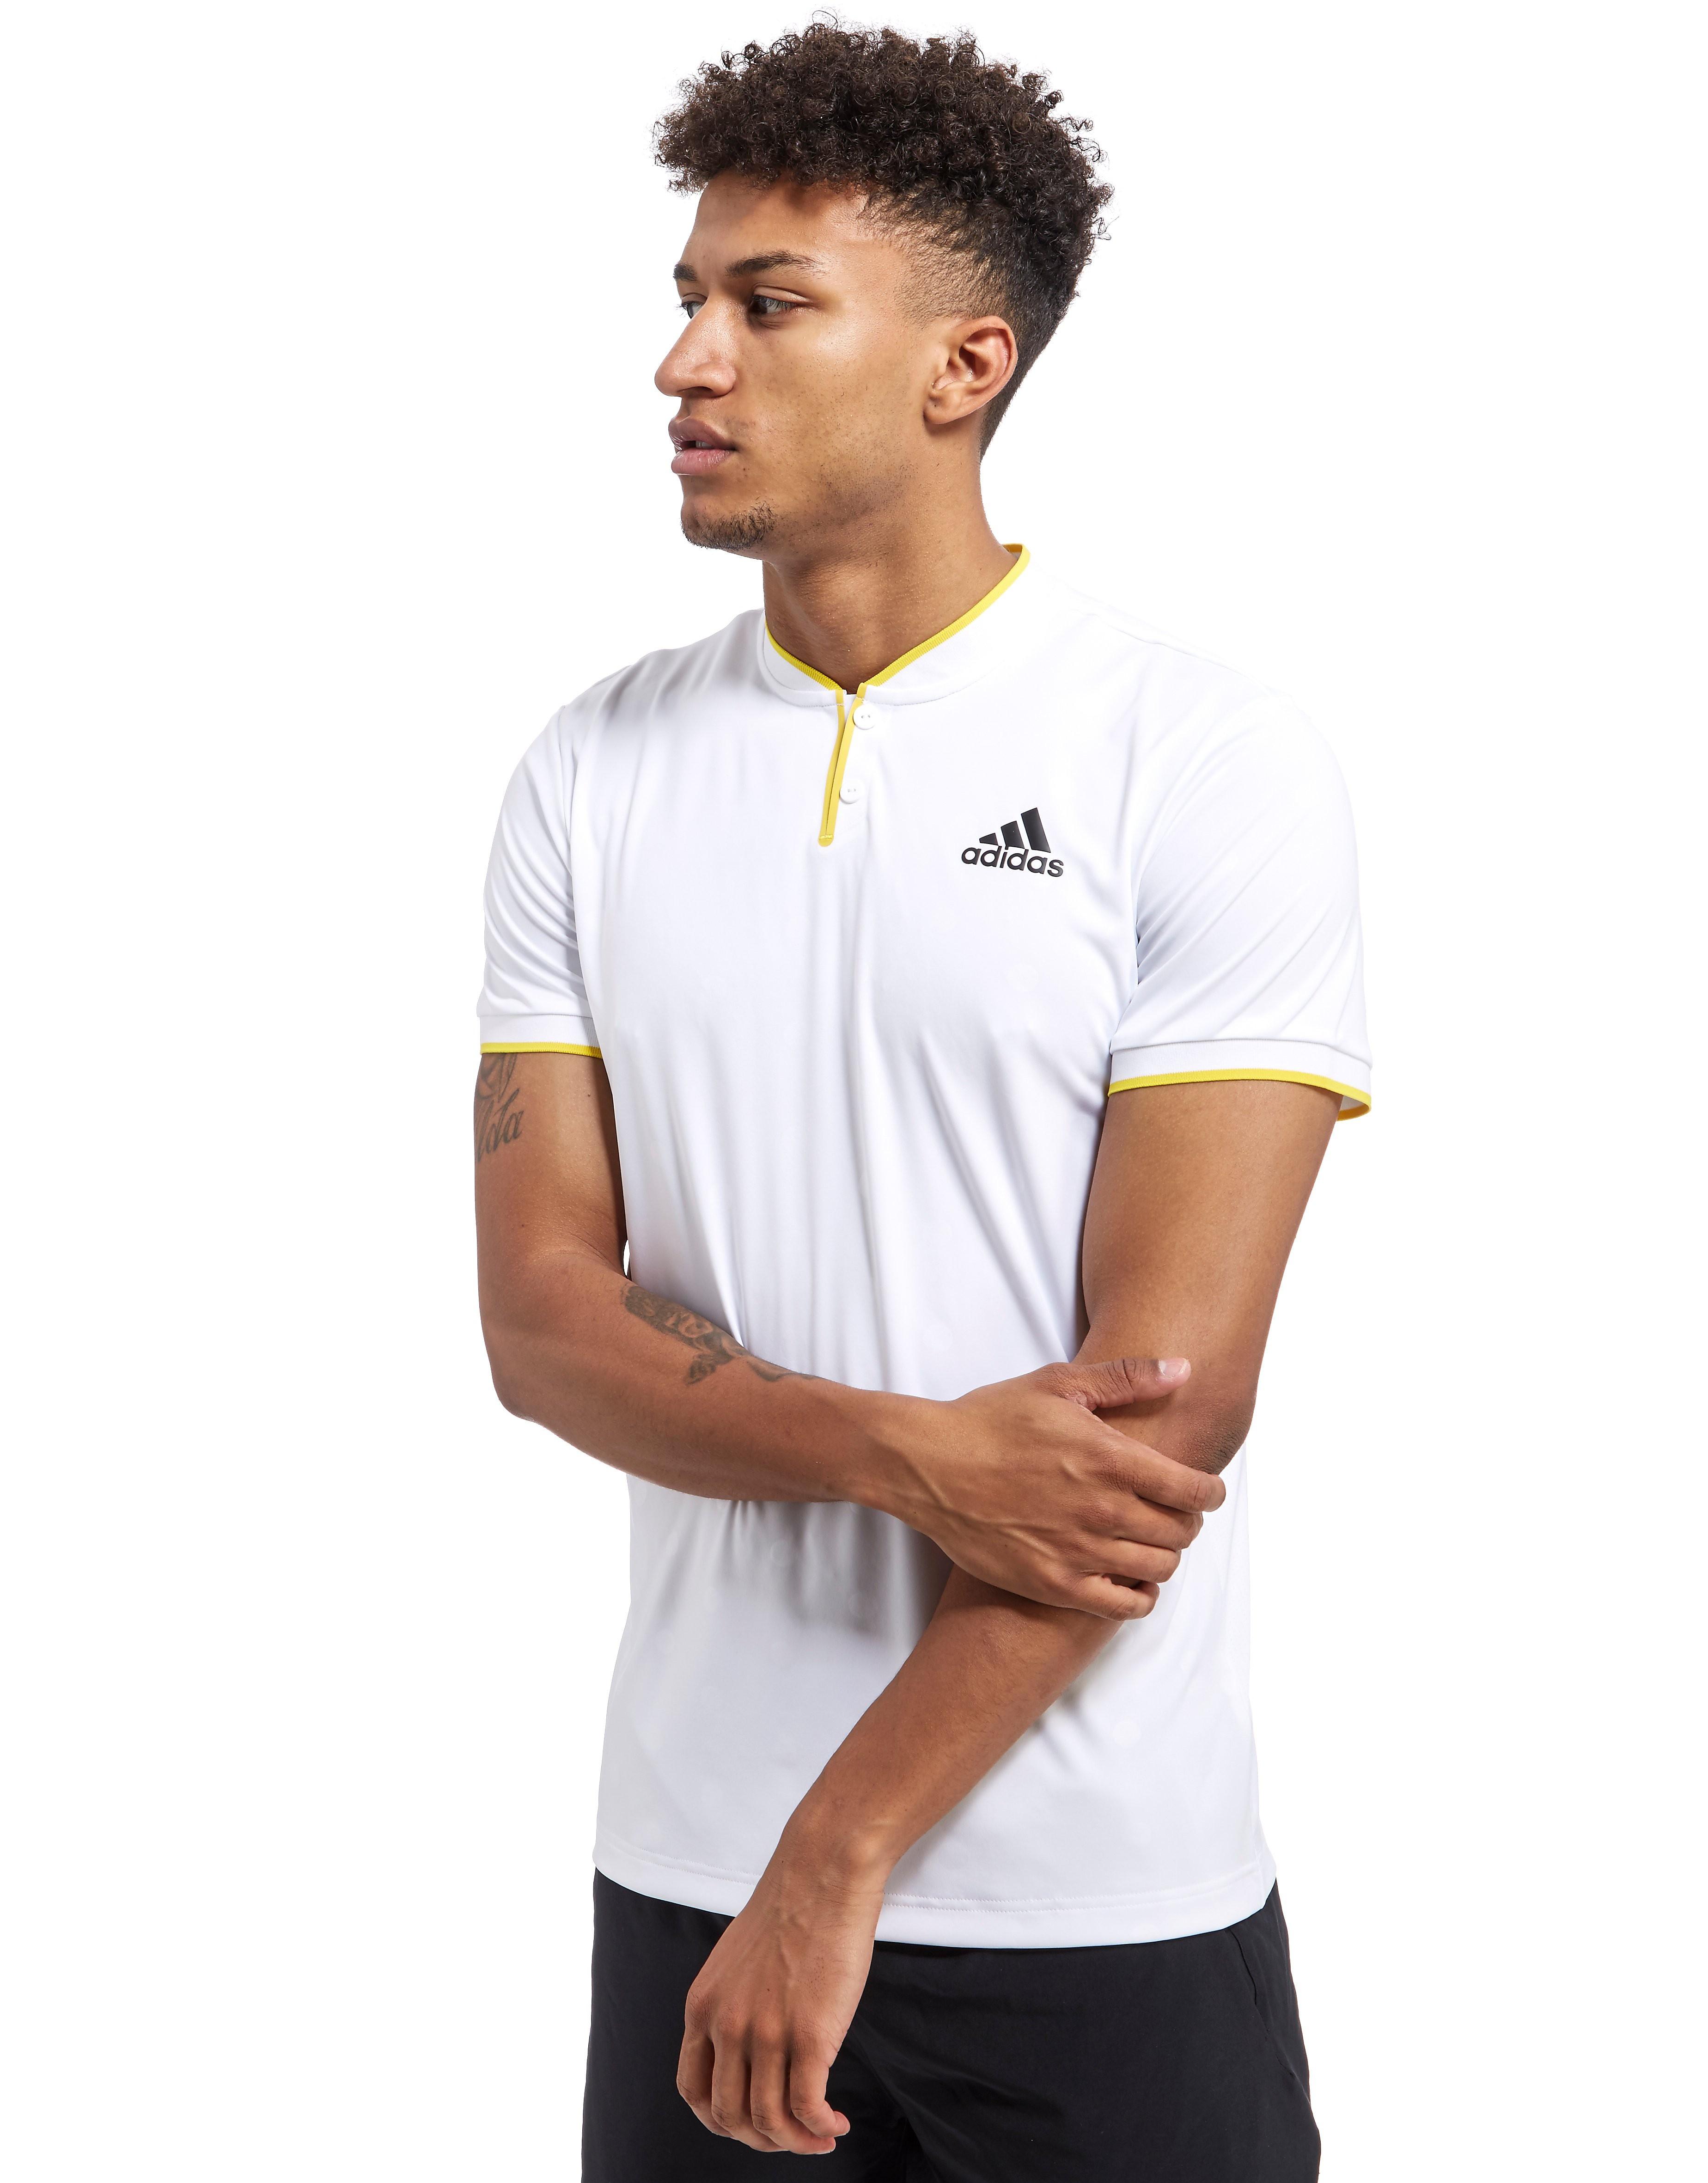 adidas London Polo Shirt